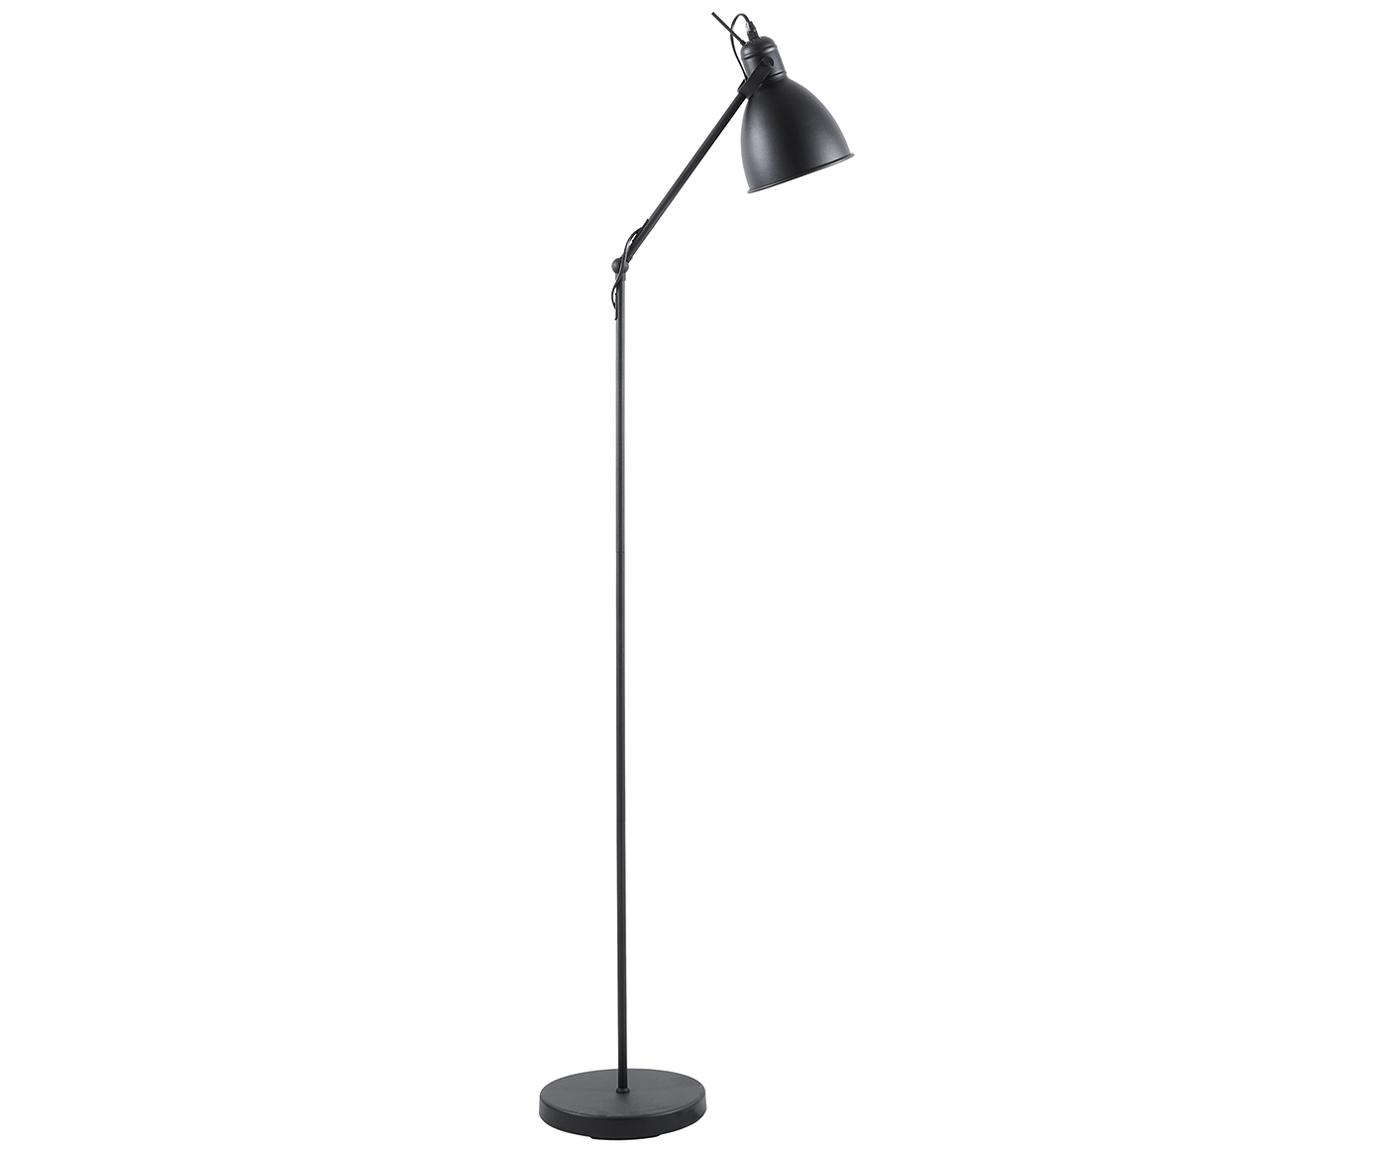 Vloerlamp Ethan, Lampenkap: gepoedercoat metaal, Lampvoet: gepoedercoat metaal, Zwart, Ø 15 x H 137 cm